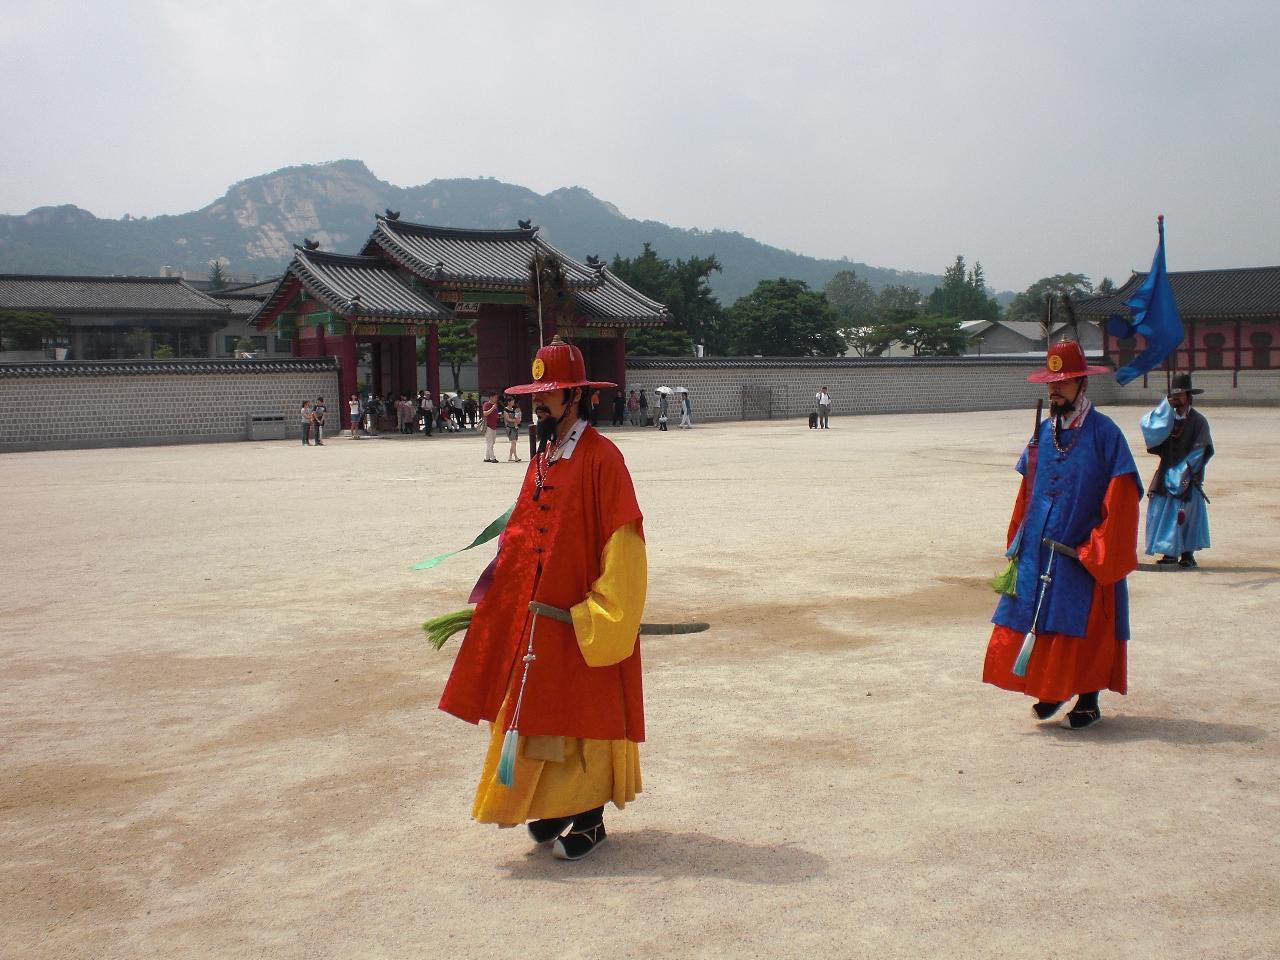 Small Group Tour to Gyeongbokgung Palace and Bukchon Hanok Village